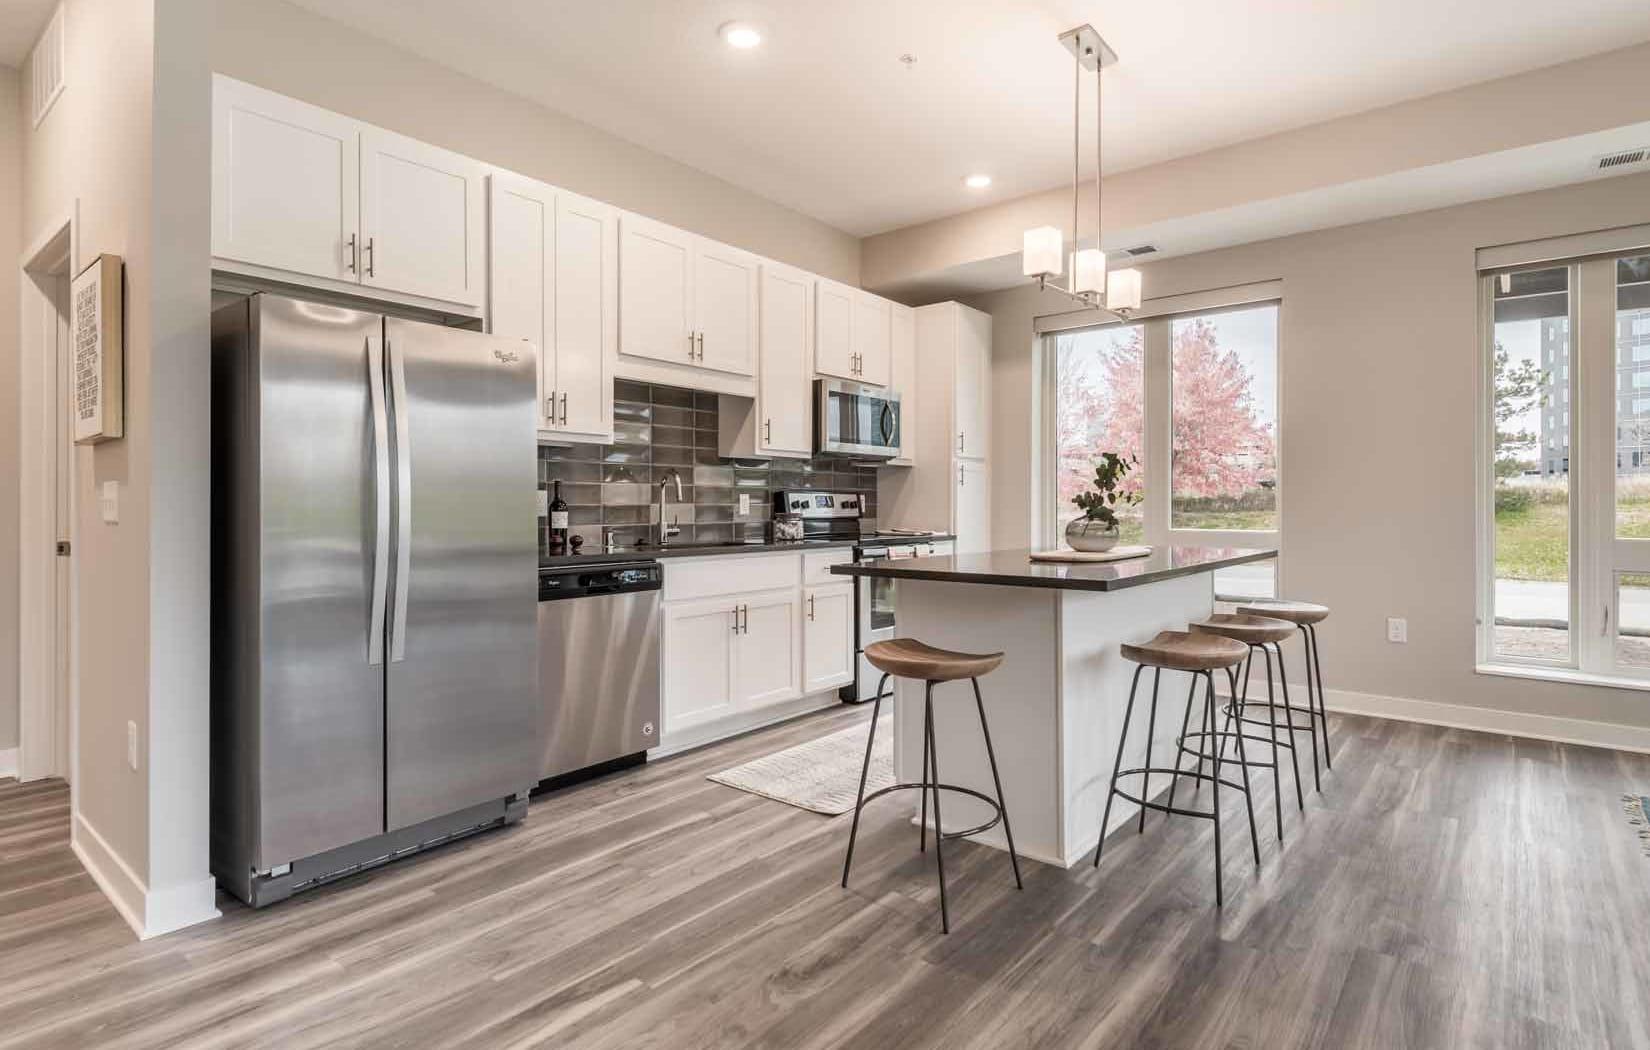 Kitchens feature quartz countertops and designer subway tile